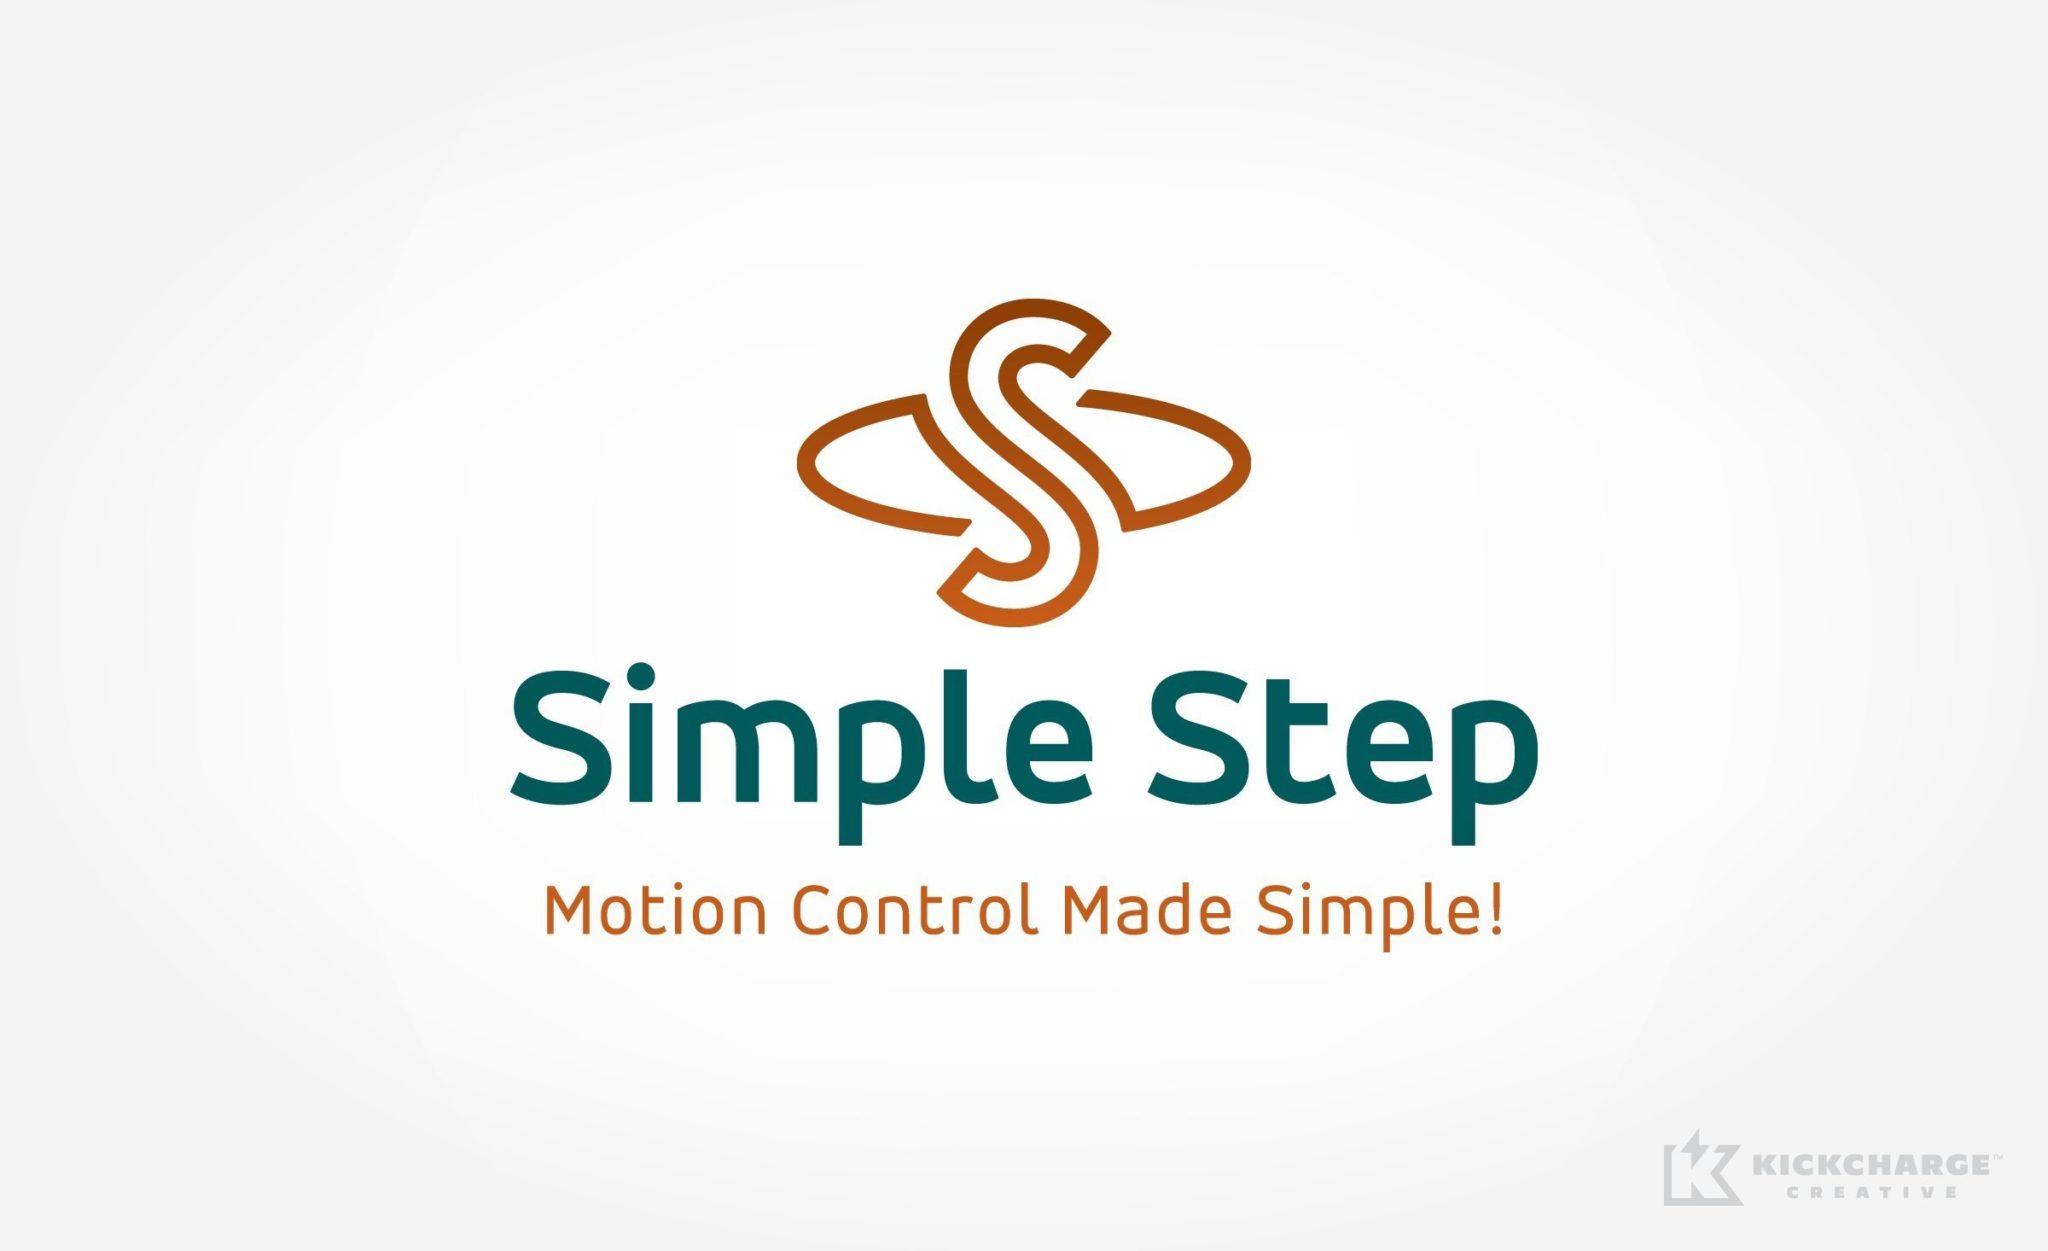 Simple Step